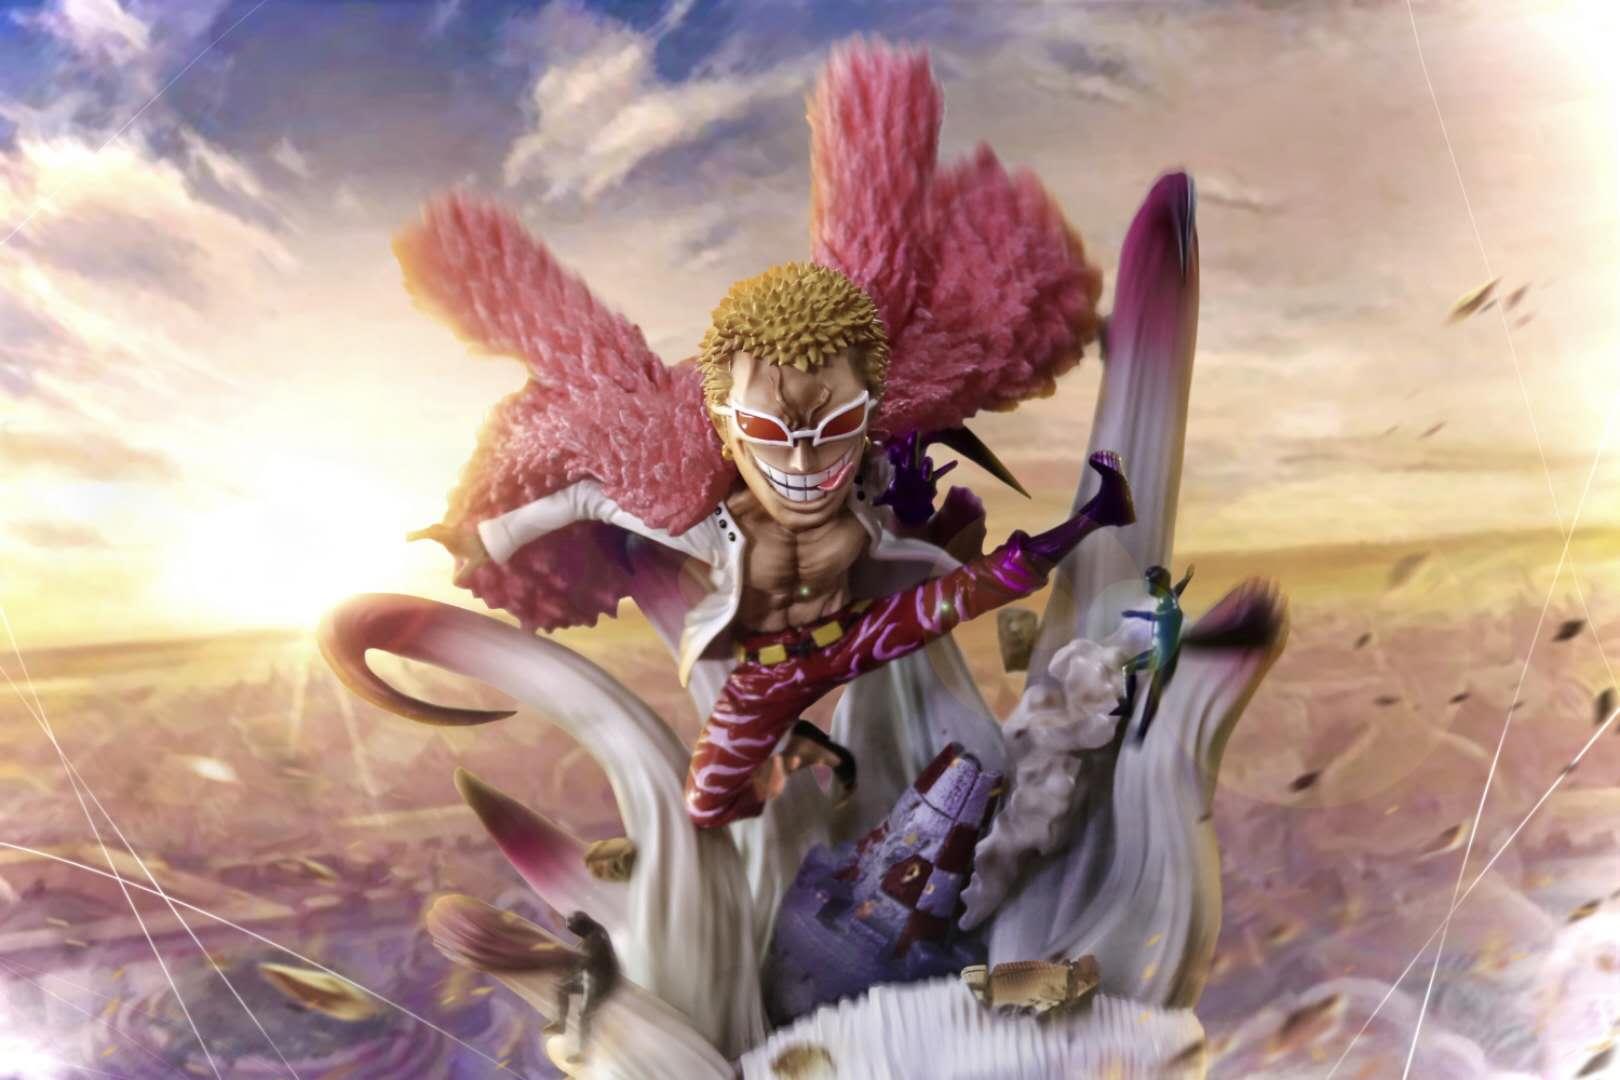 G5 Studio One Piece Monkey·D·Dragon Figure Model Resin Statue WCF Size 8cm GK